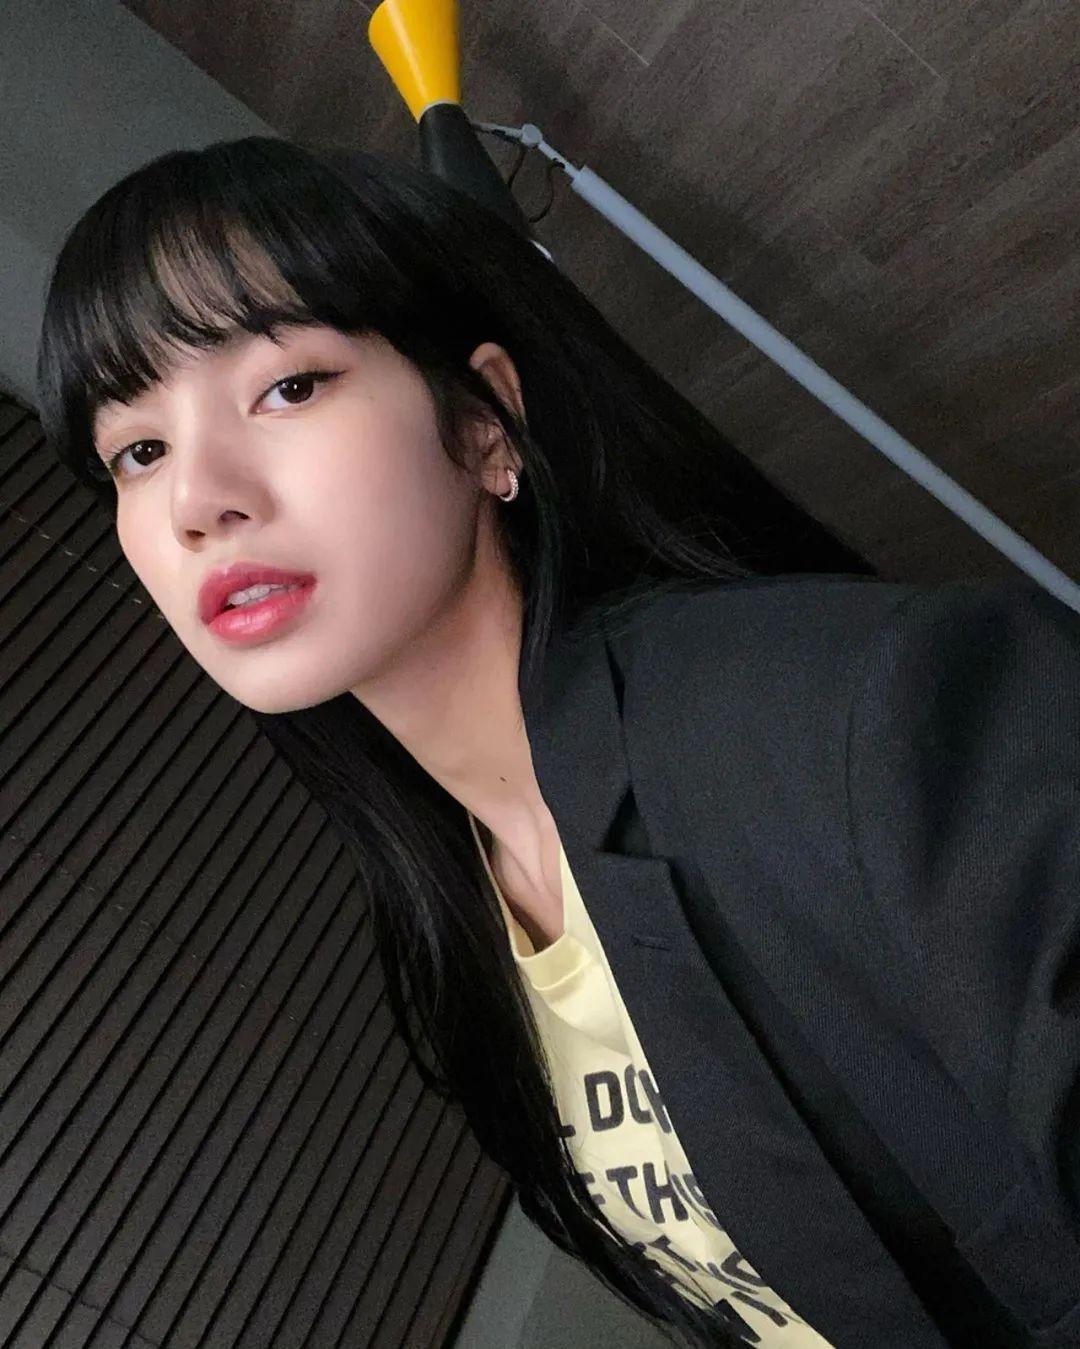 BLACKPINK Lisa自爆刘海不乱秘诀﹗3招手残女都学懂的刘海固定法